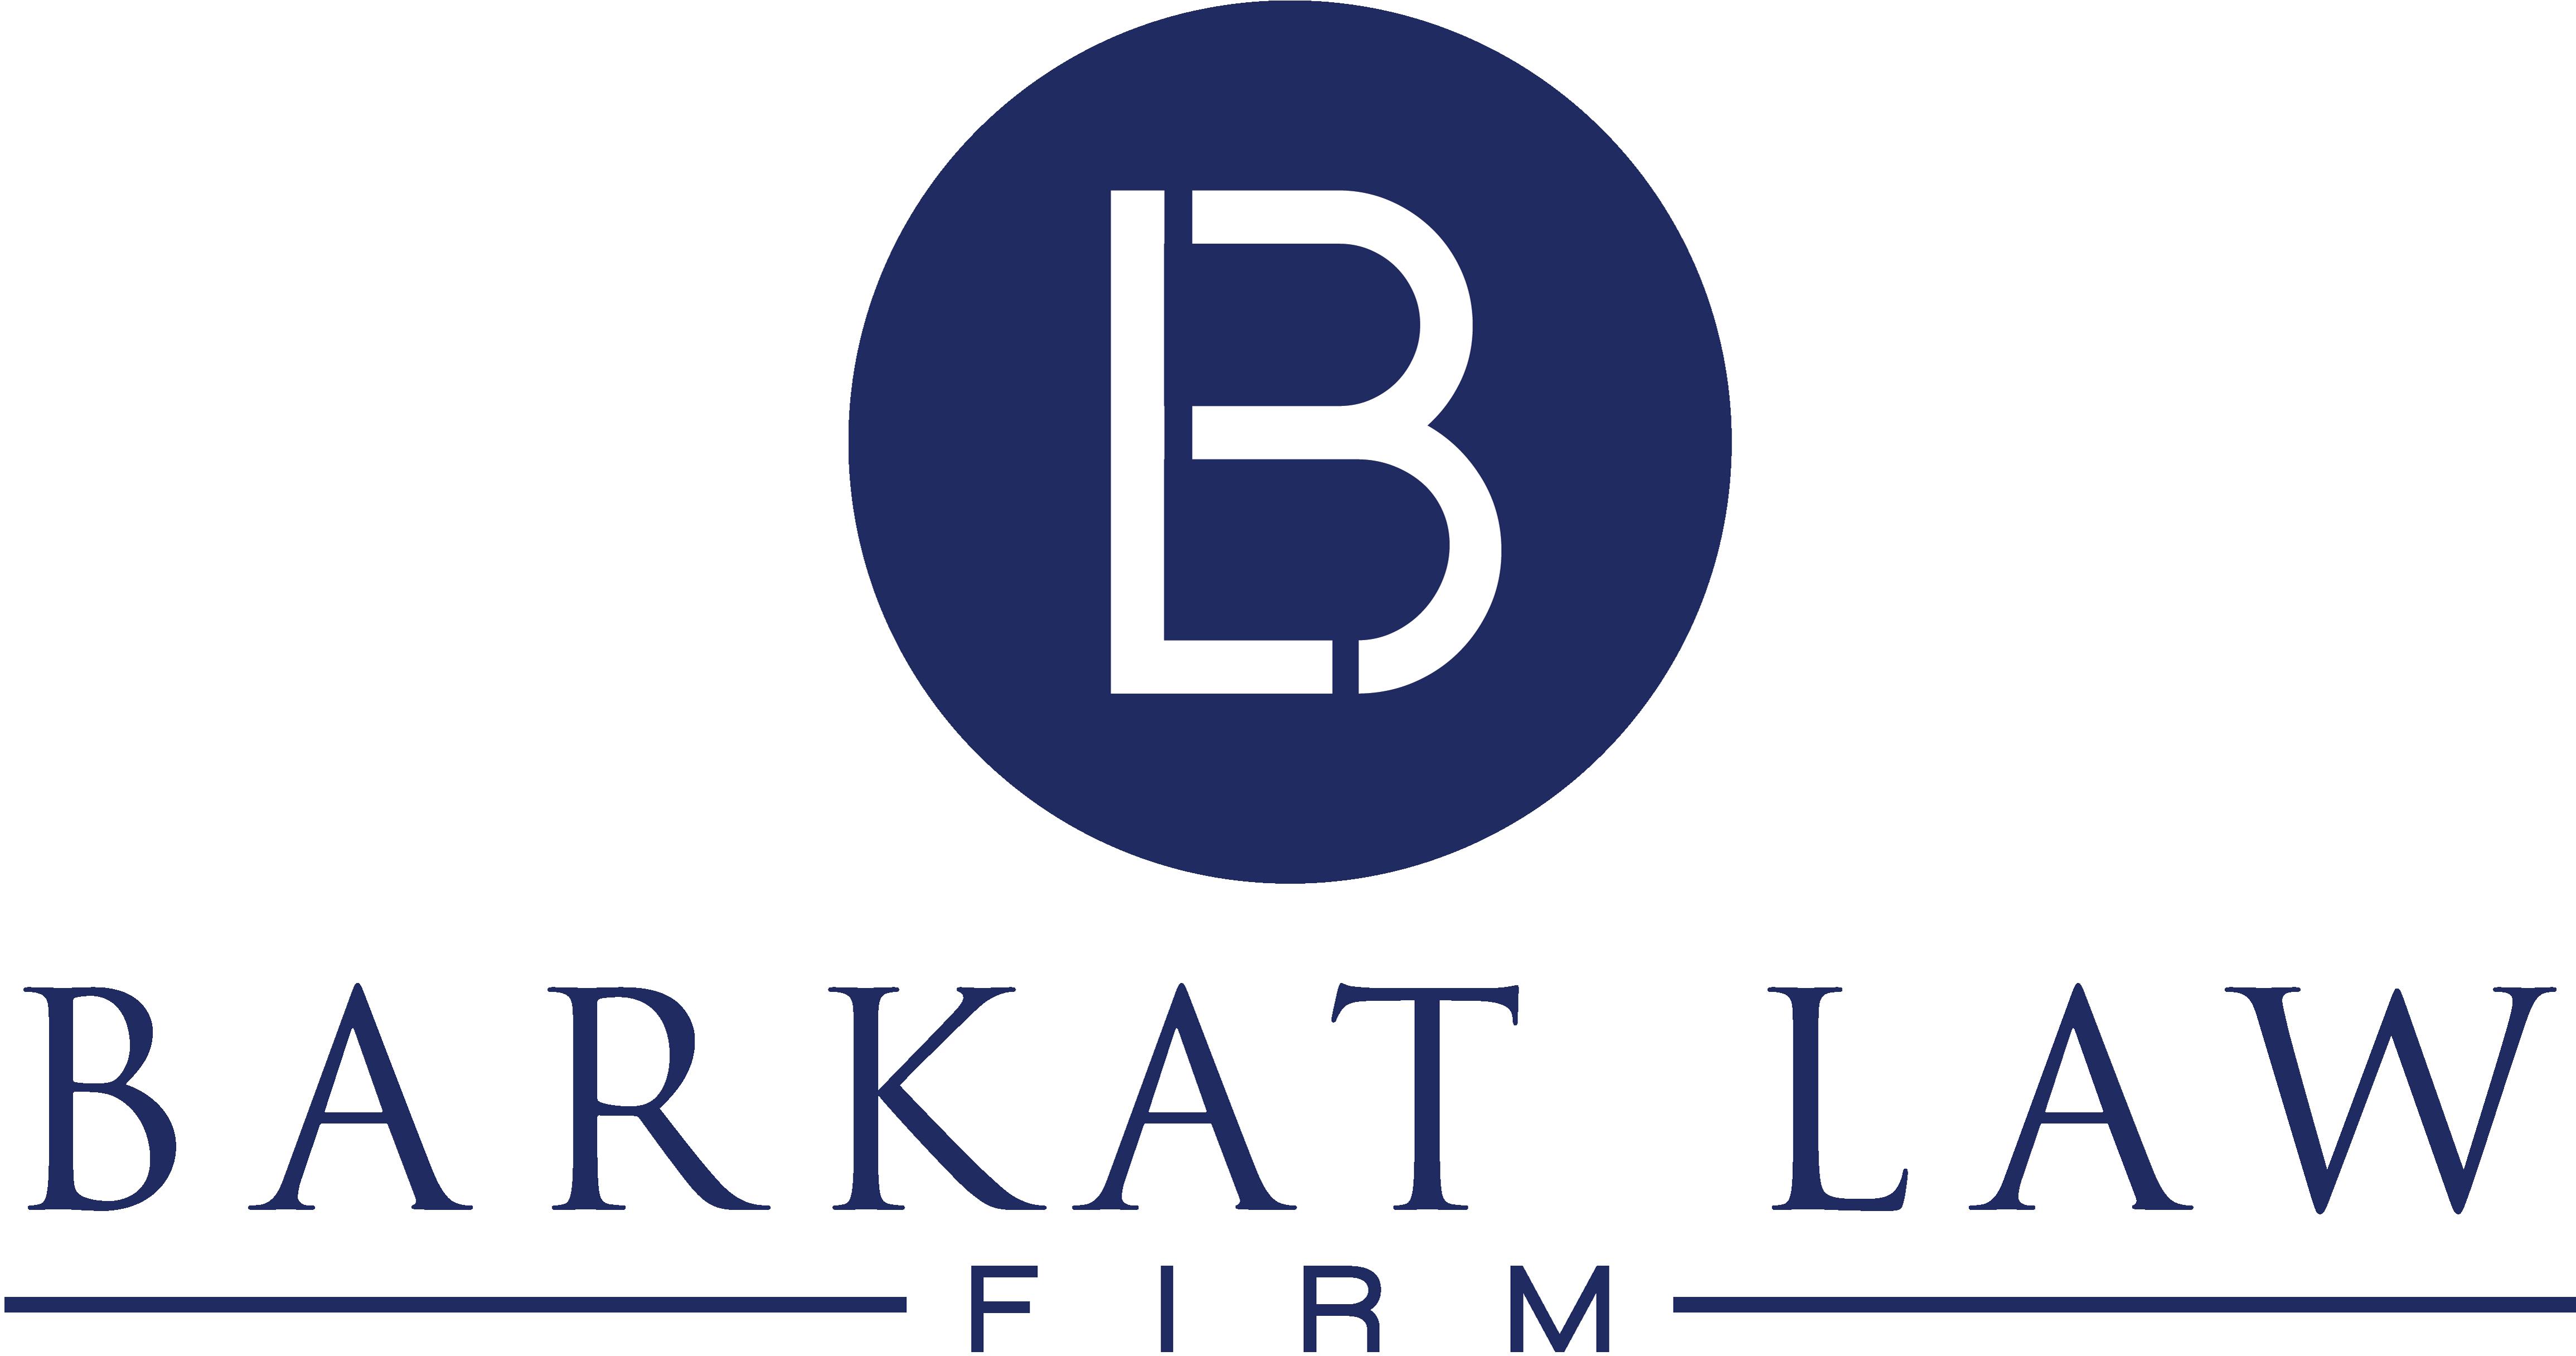 Barkat Law Firm